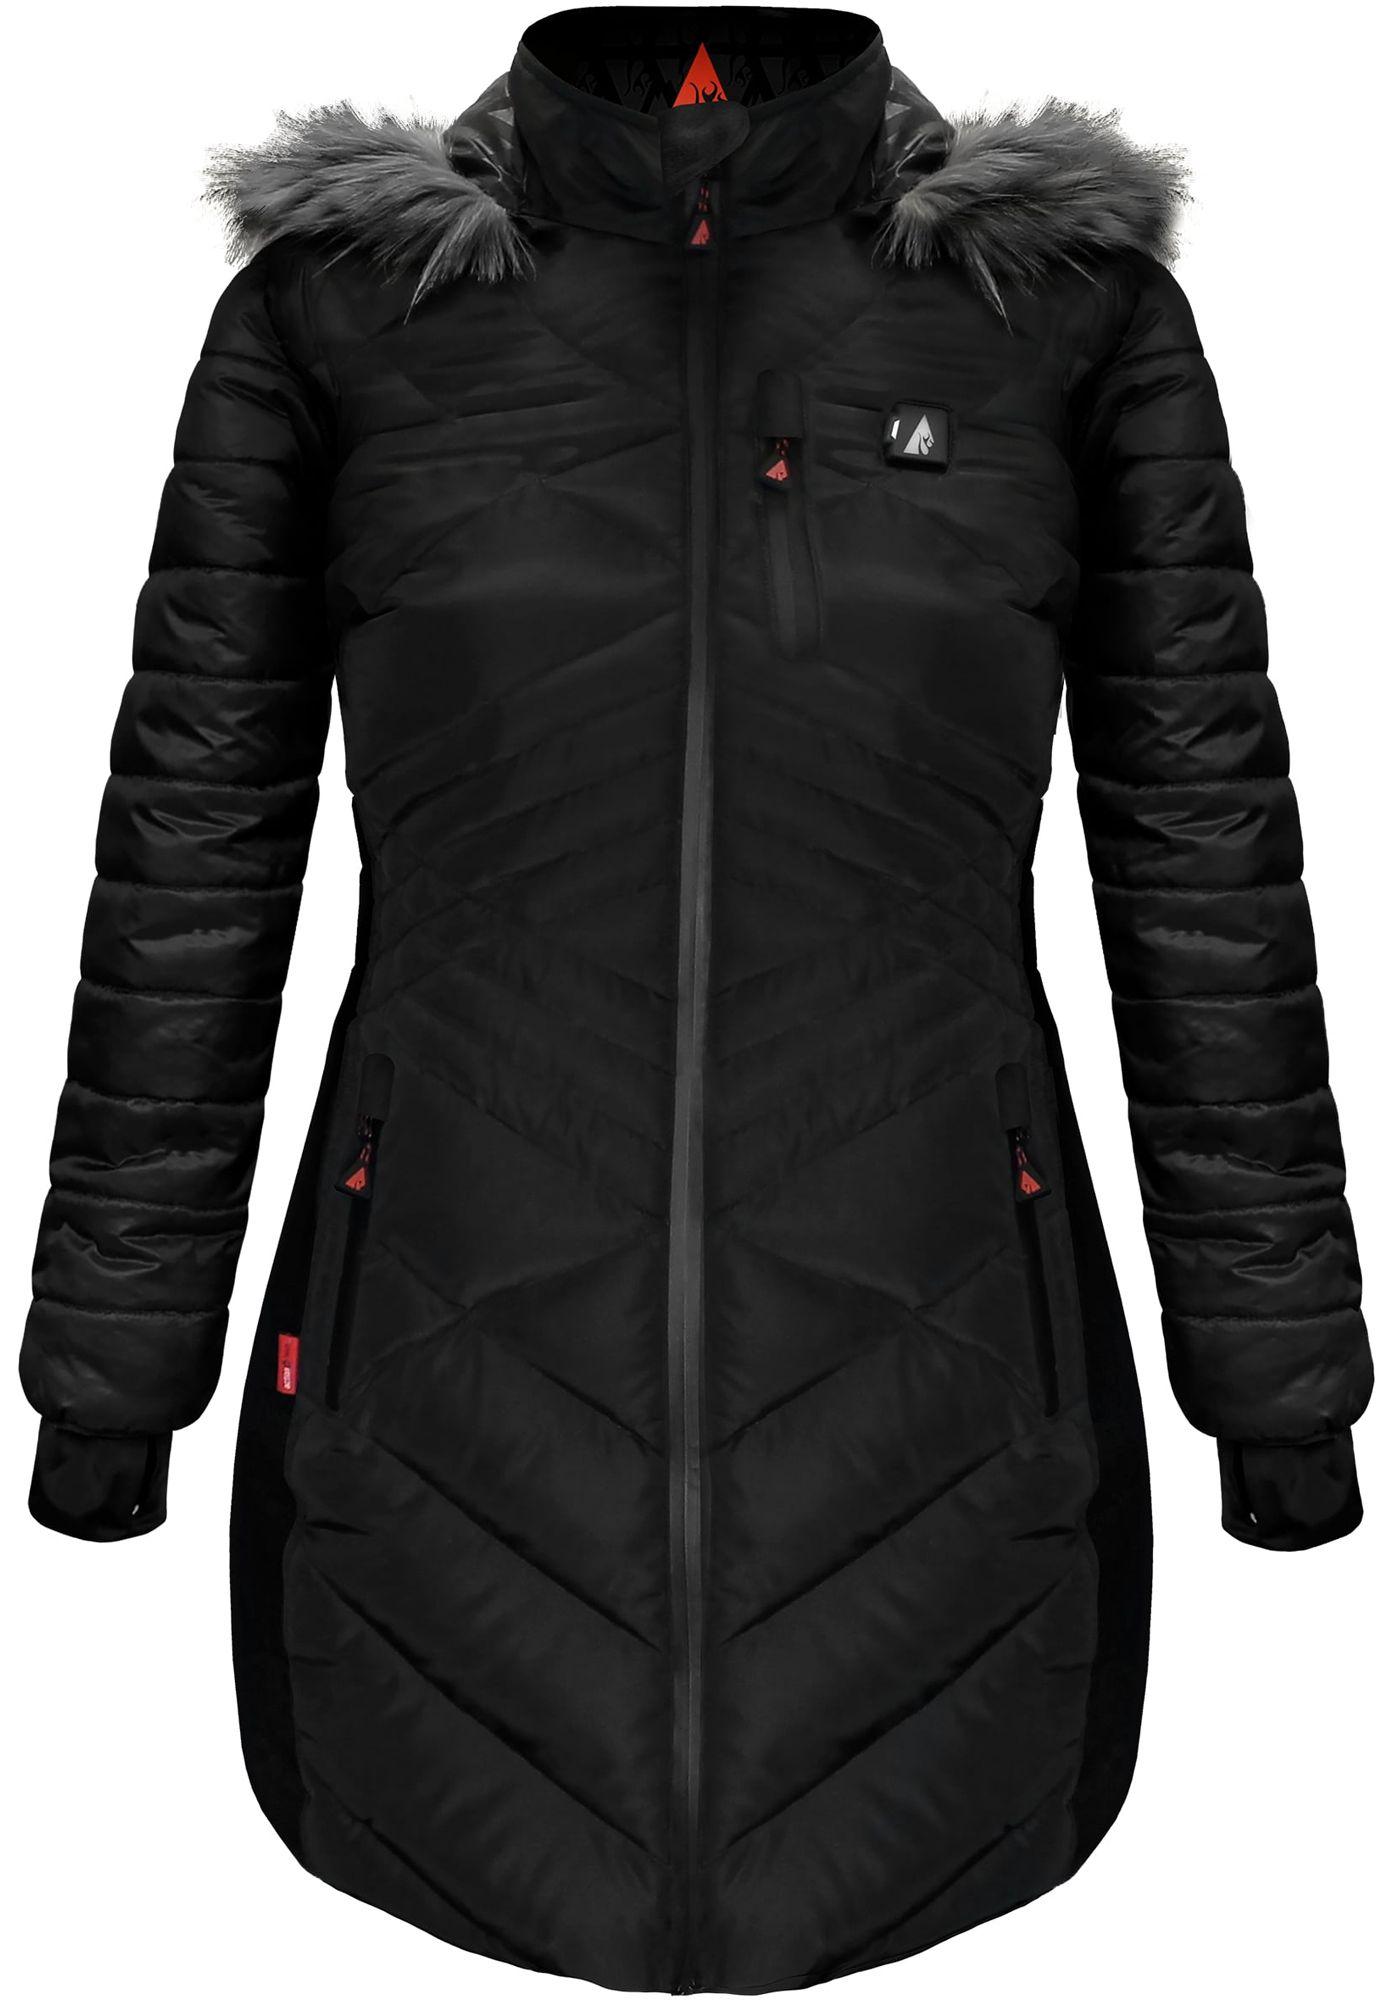 ActionHeat Women's 5V Heated Puffer Jacket